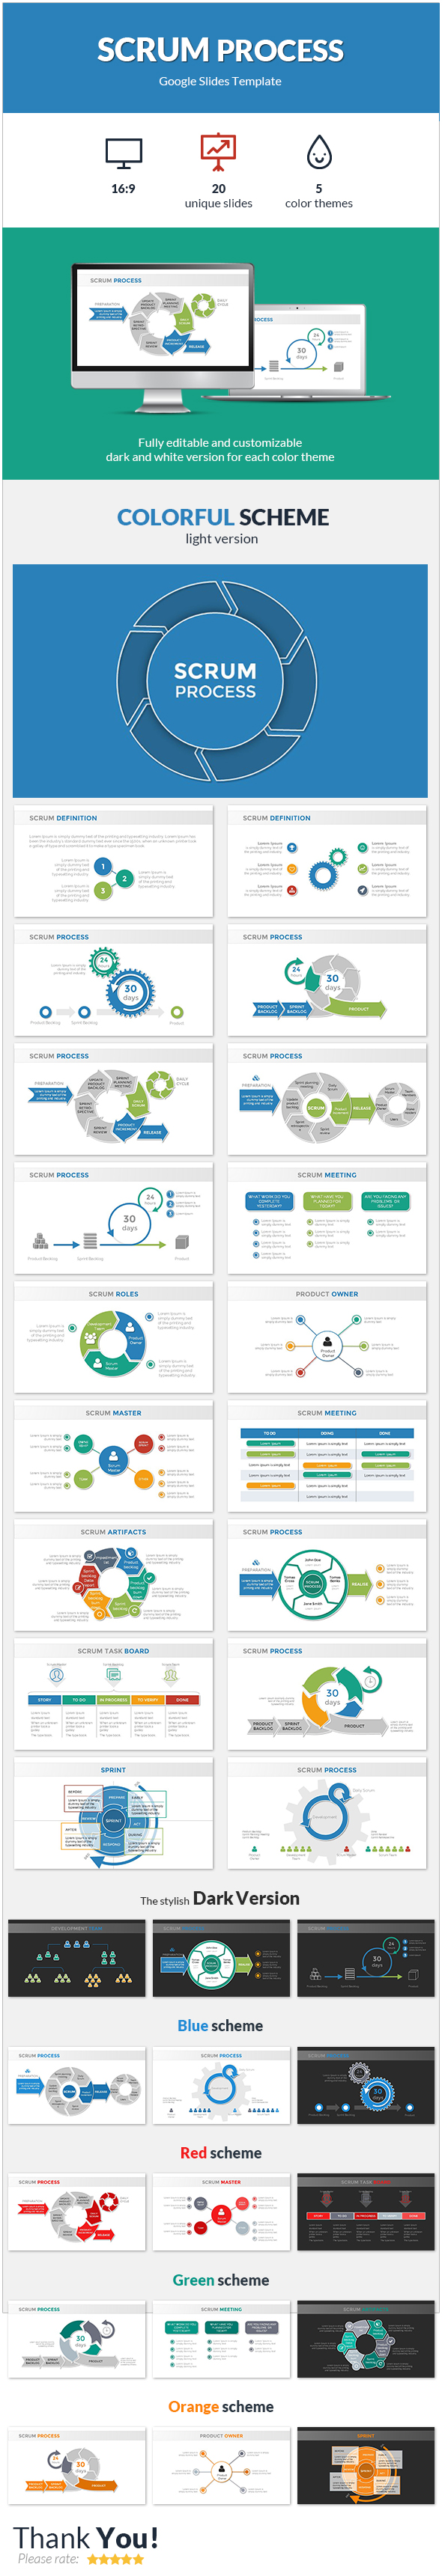 Scrum Process Google Slides Template - Google Slides Presentation Templates